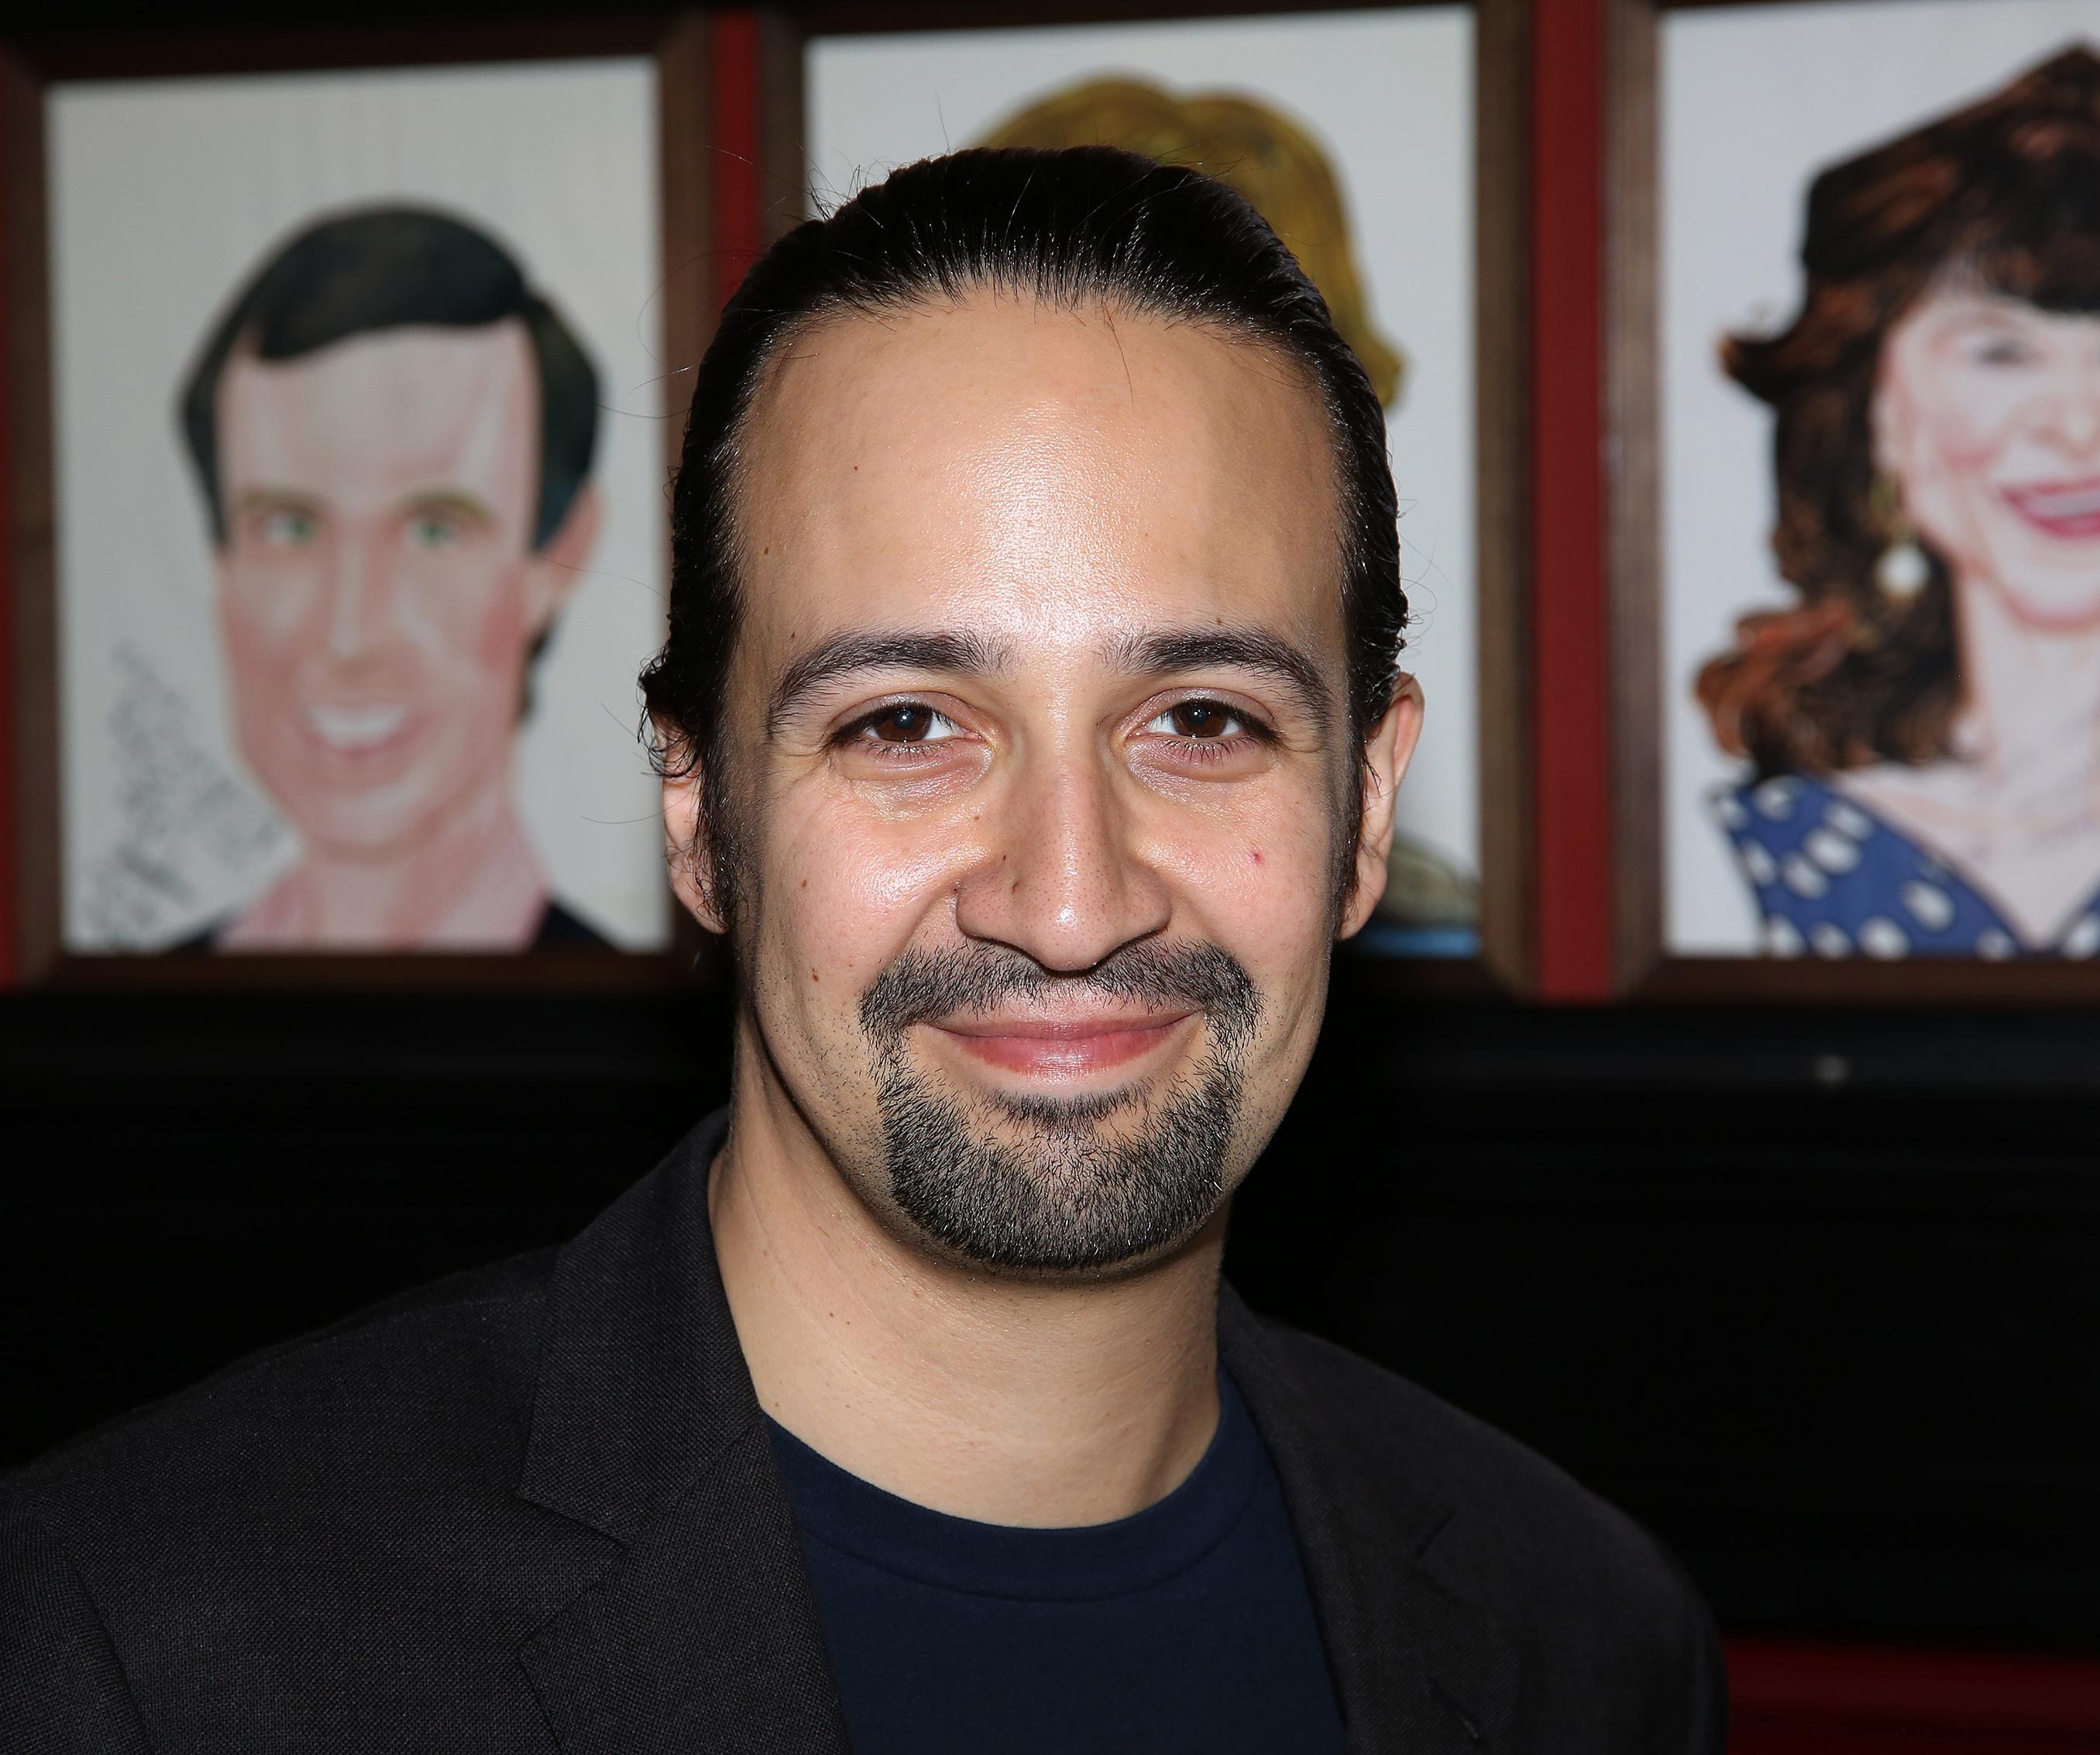 Lin-Manuel Miranda attends the Lin-Manuel Miranda 'Hamilton' Sardi's Portrait unveiling at Sardi's on May 19, 2016 in New York City.